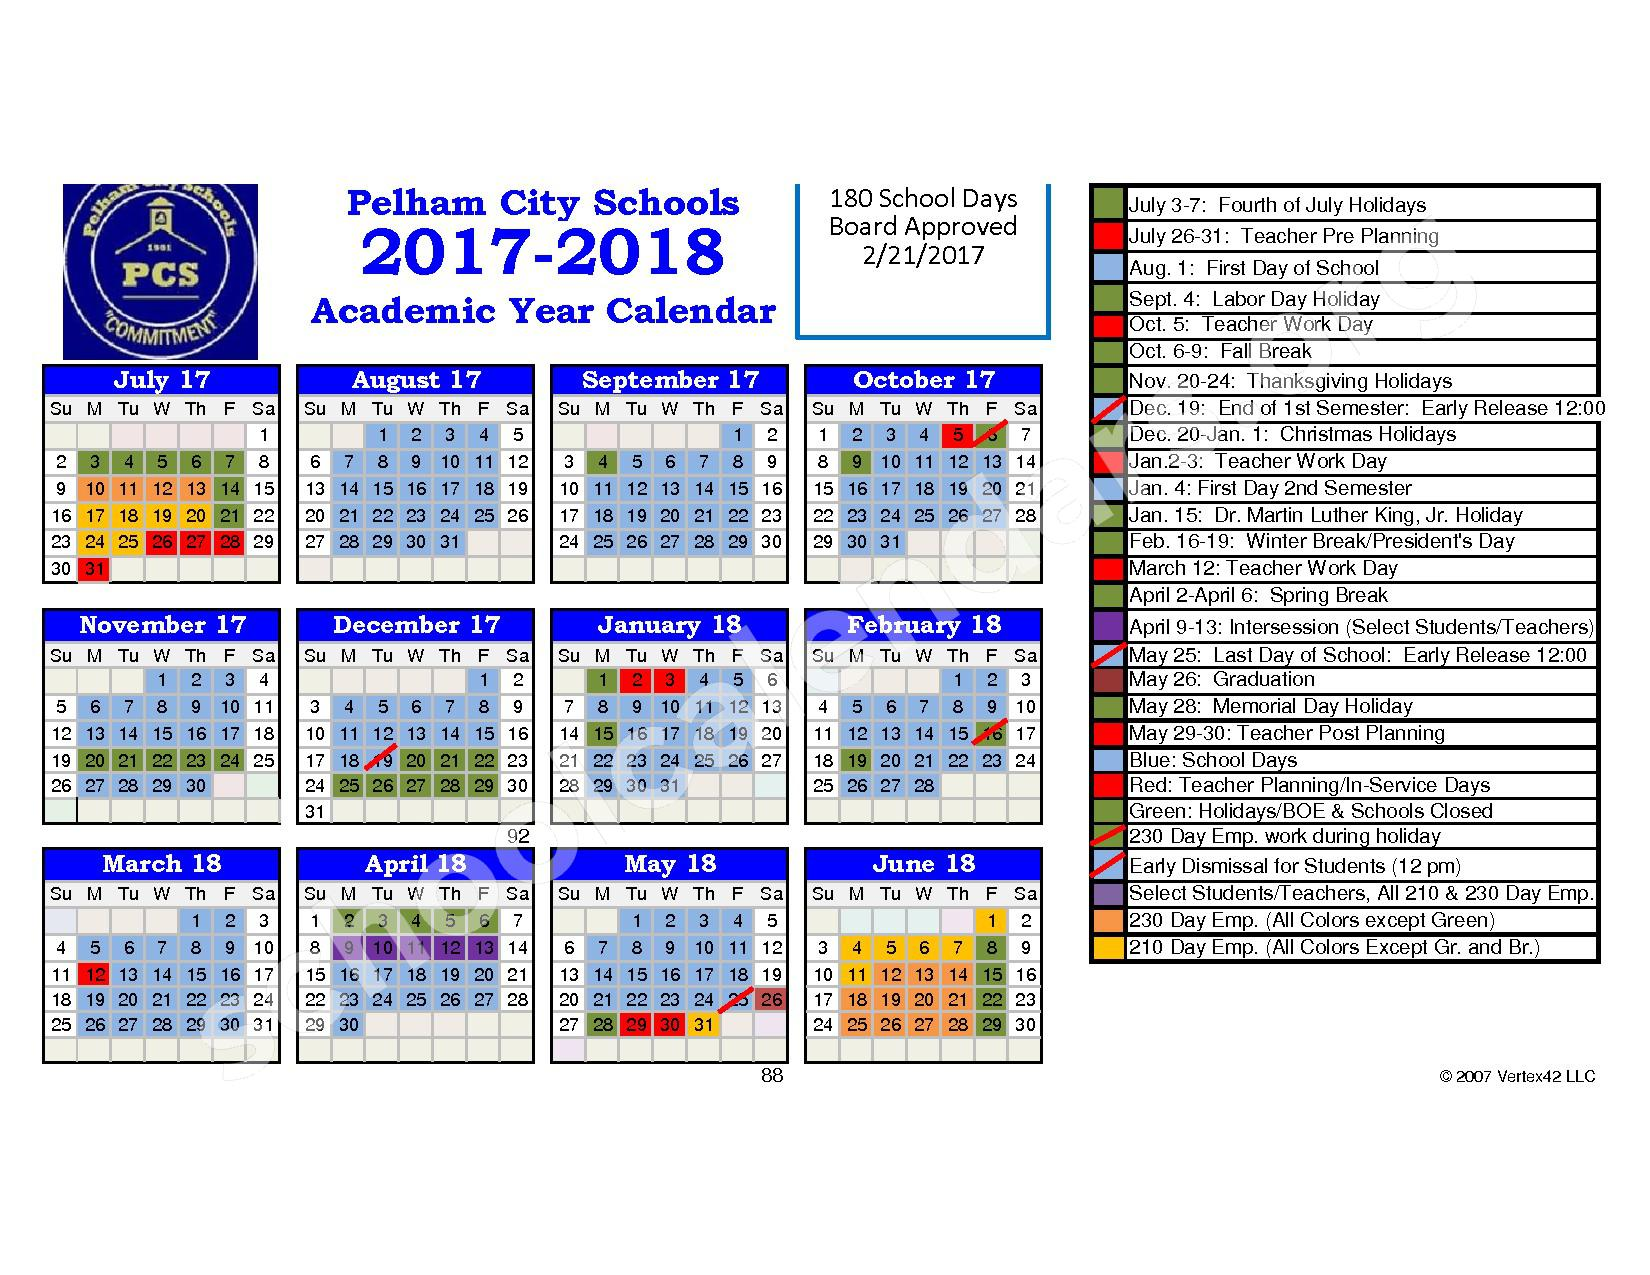 New York City School Calendar 2016 2017 Tuition And Fees 2017 2018 The New School In New York City Pelham City School District Calendars – Georgia